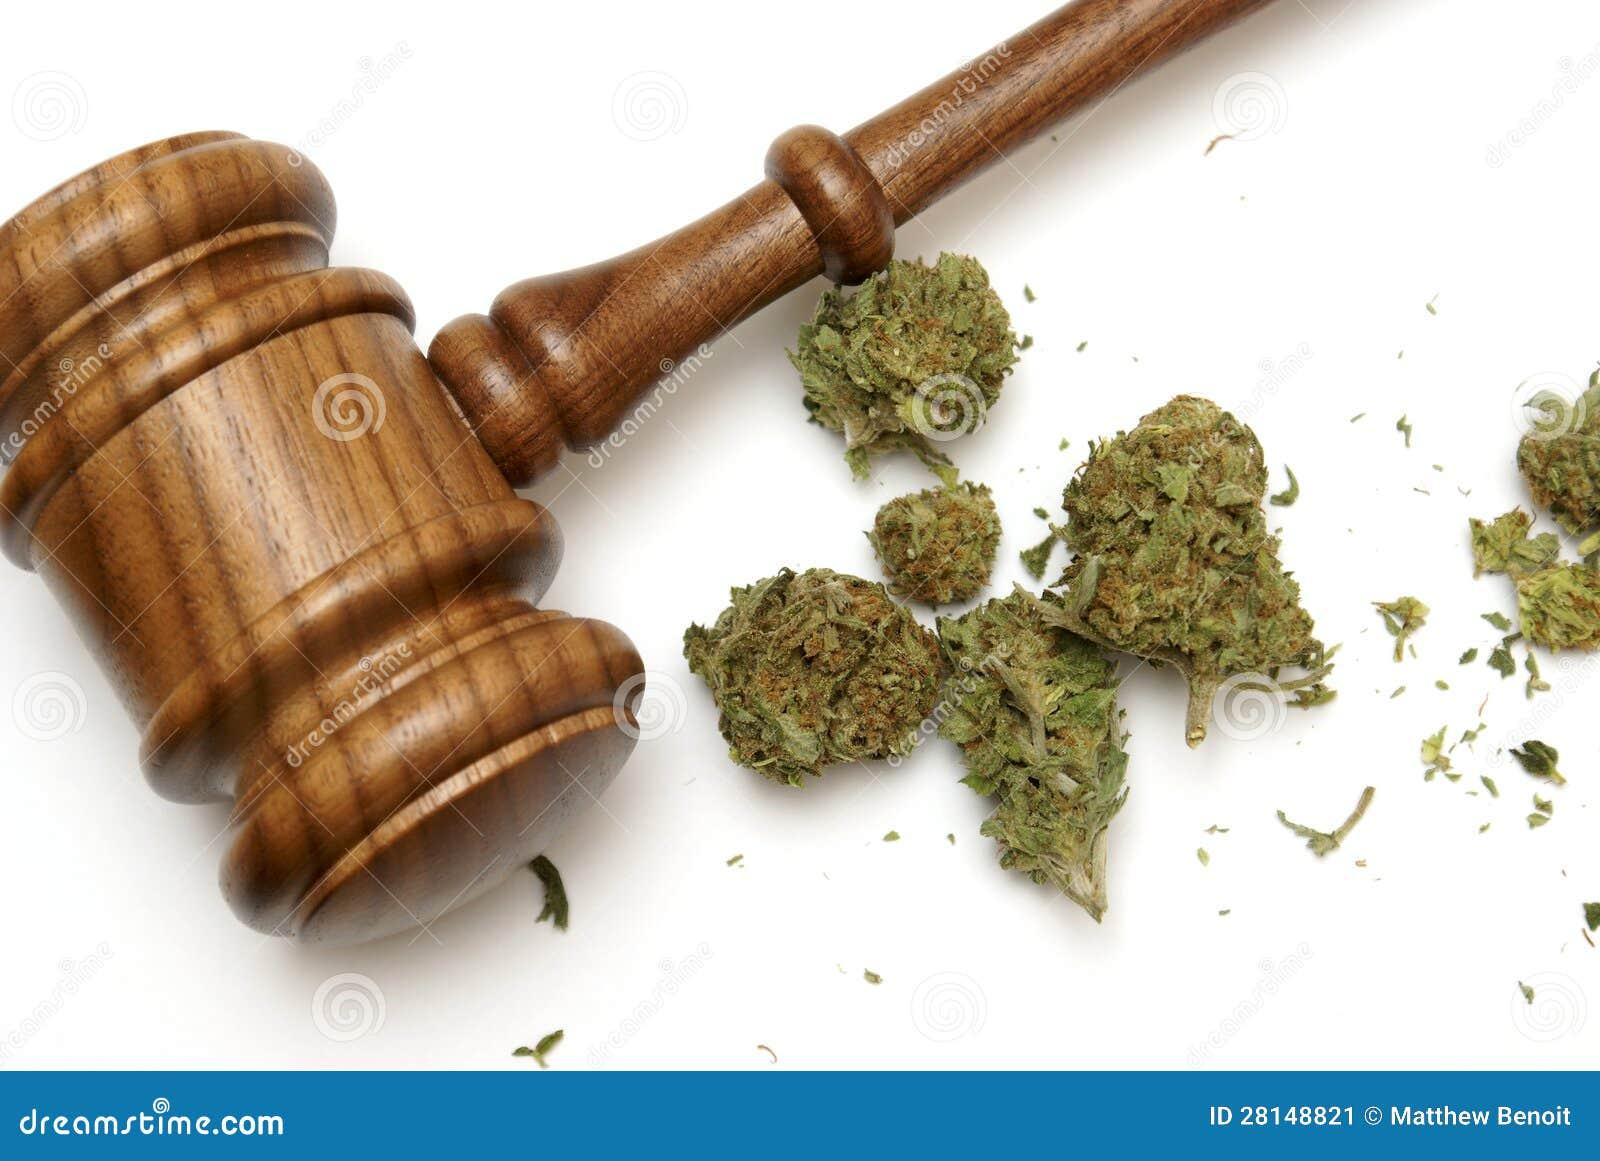 Ley y marijuana